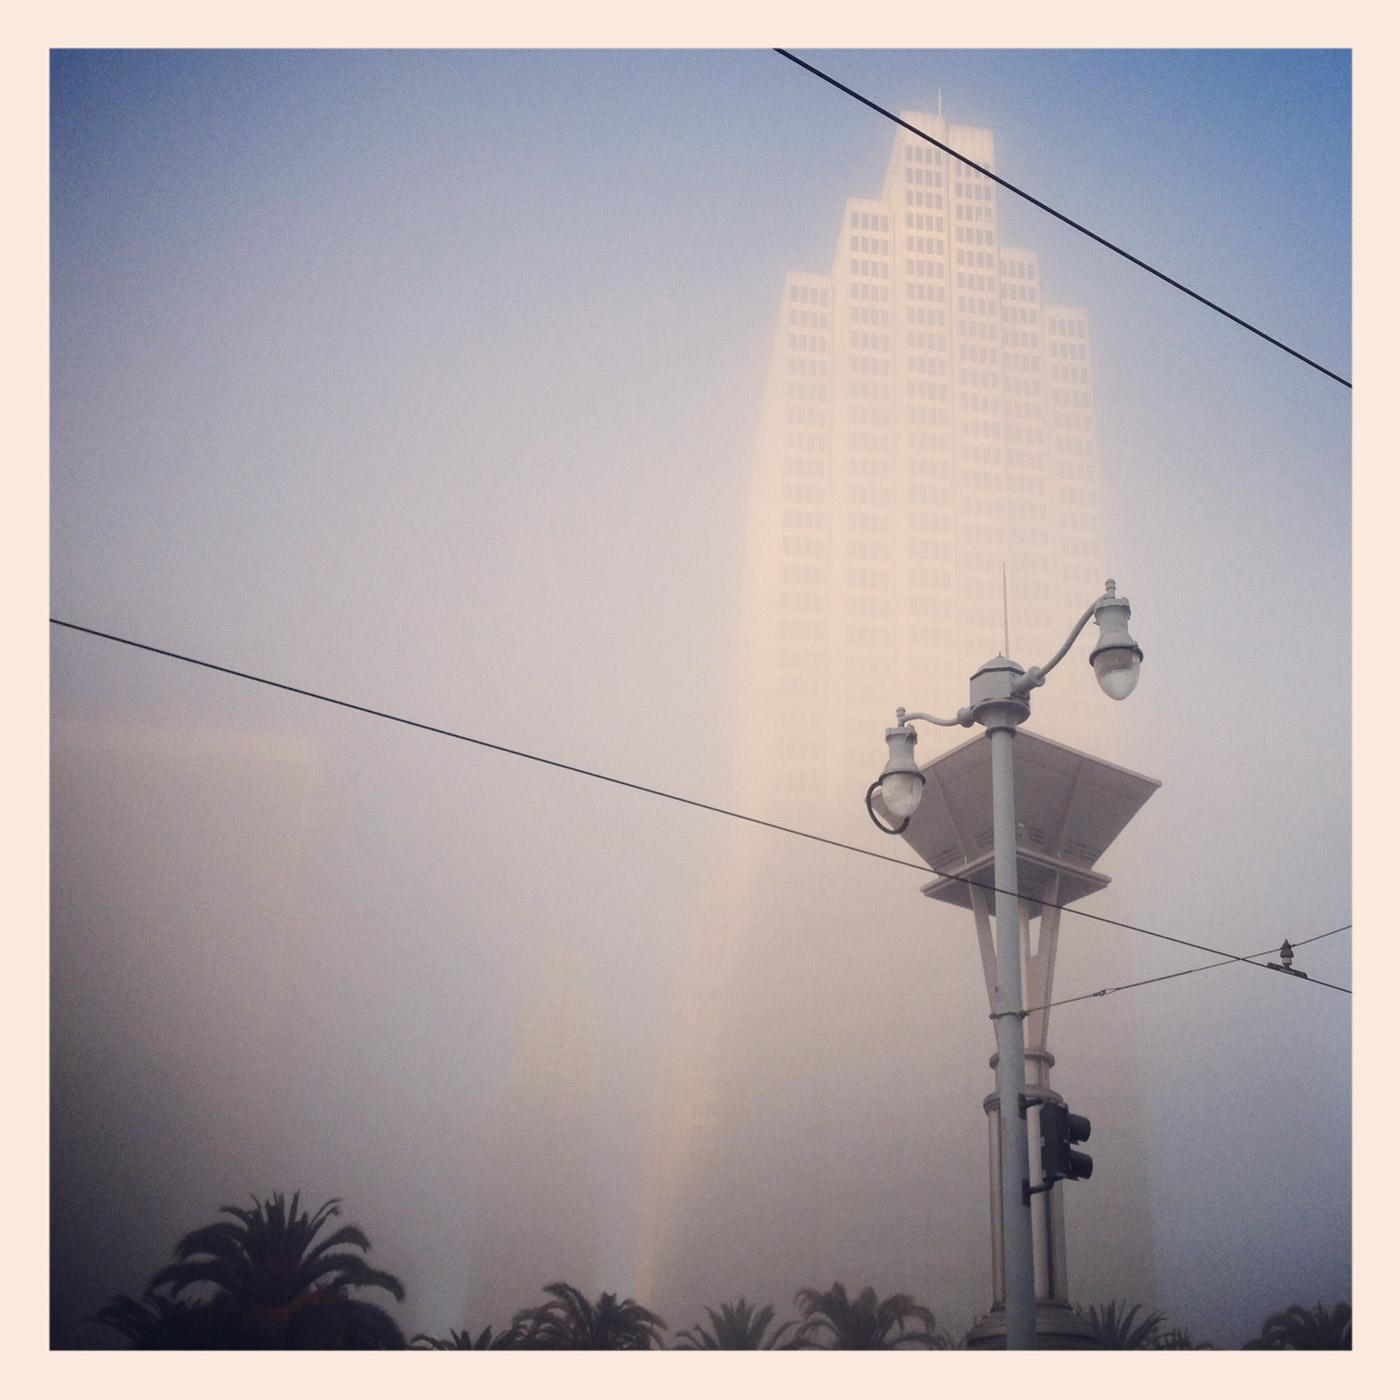 Morning Fog, Embarcadero (Instagram)